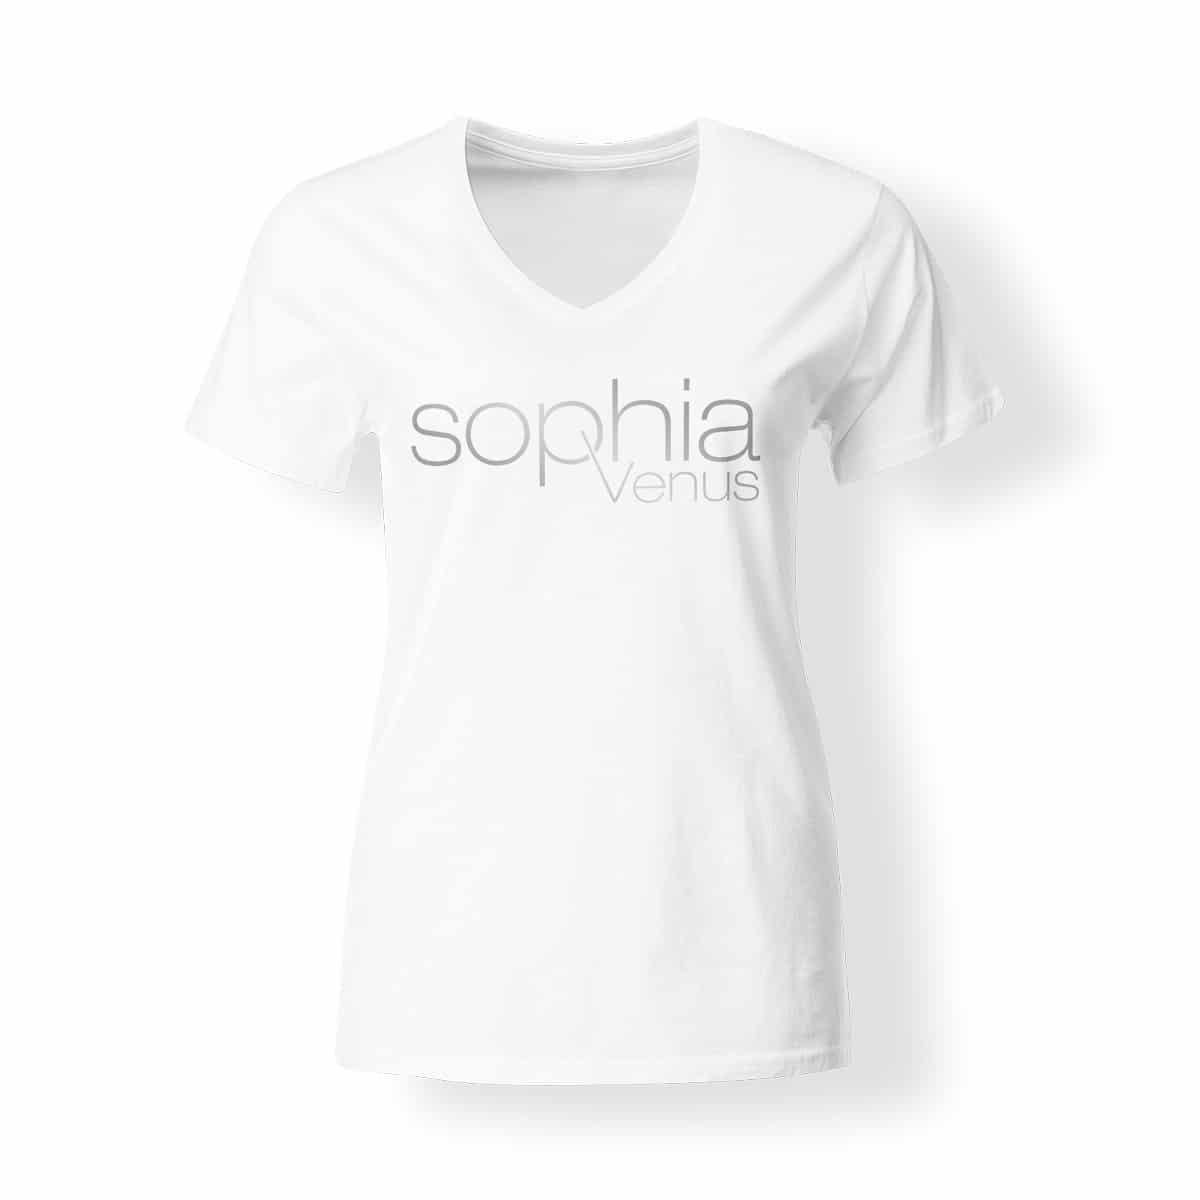 T-Shirt Damen Sophia Venus weiß